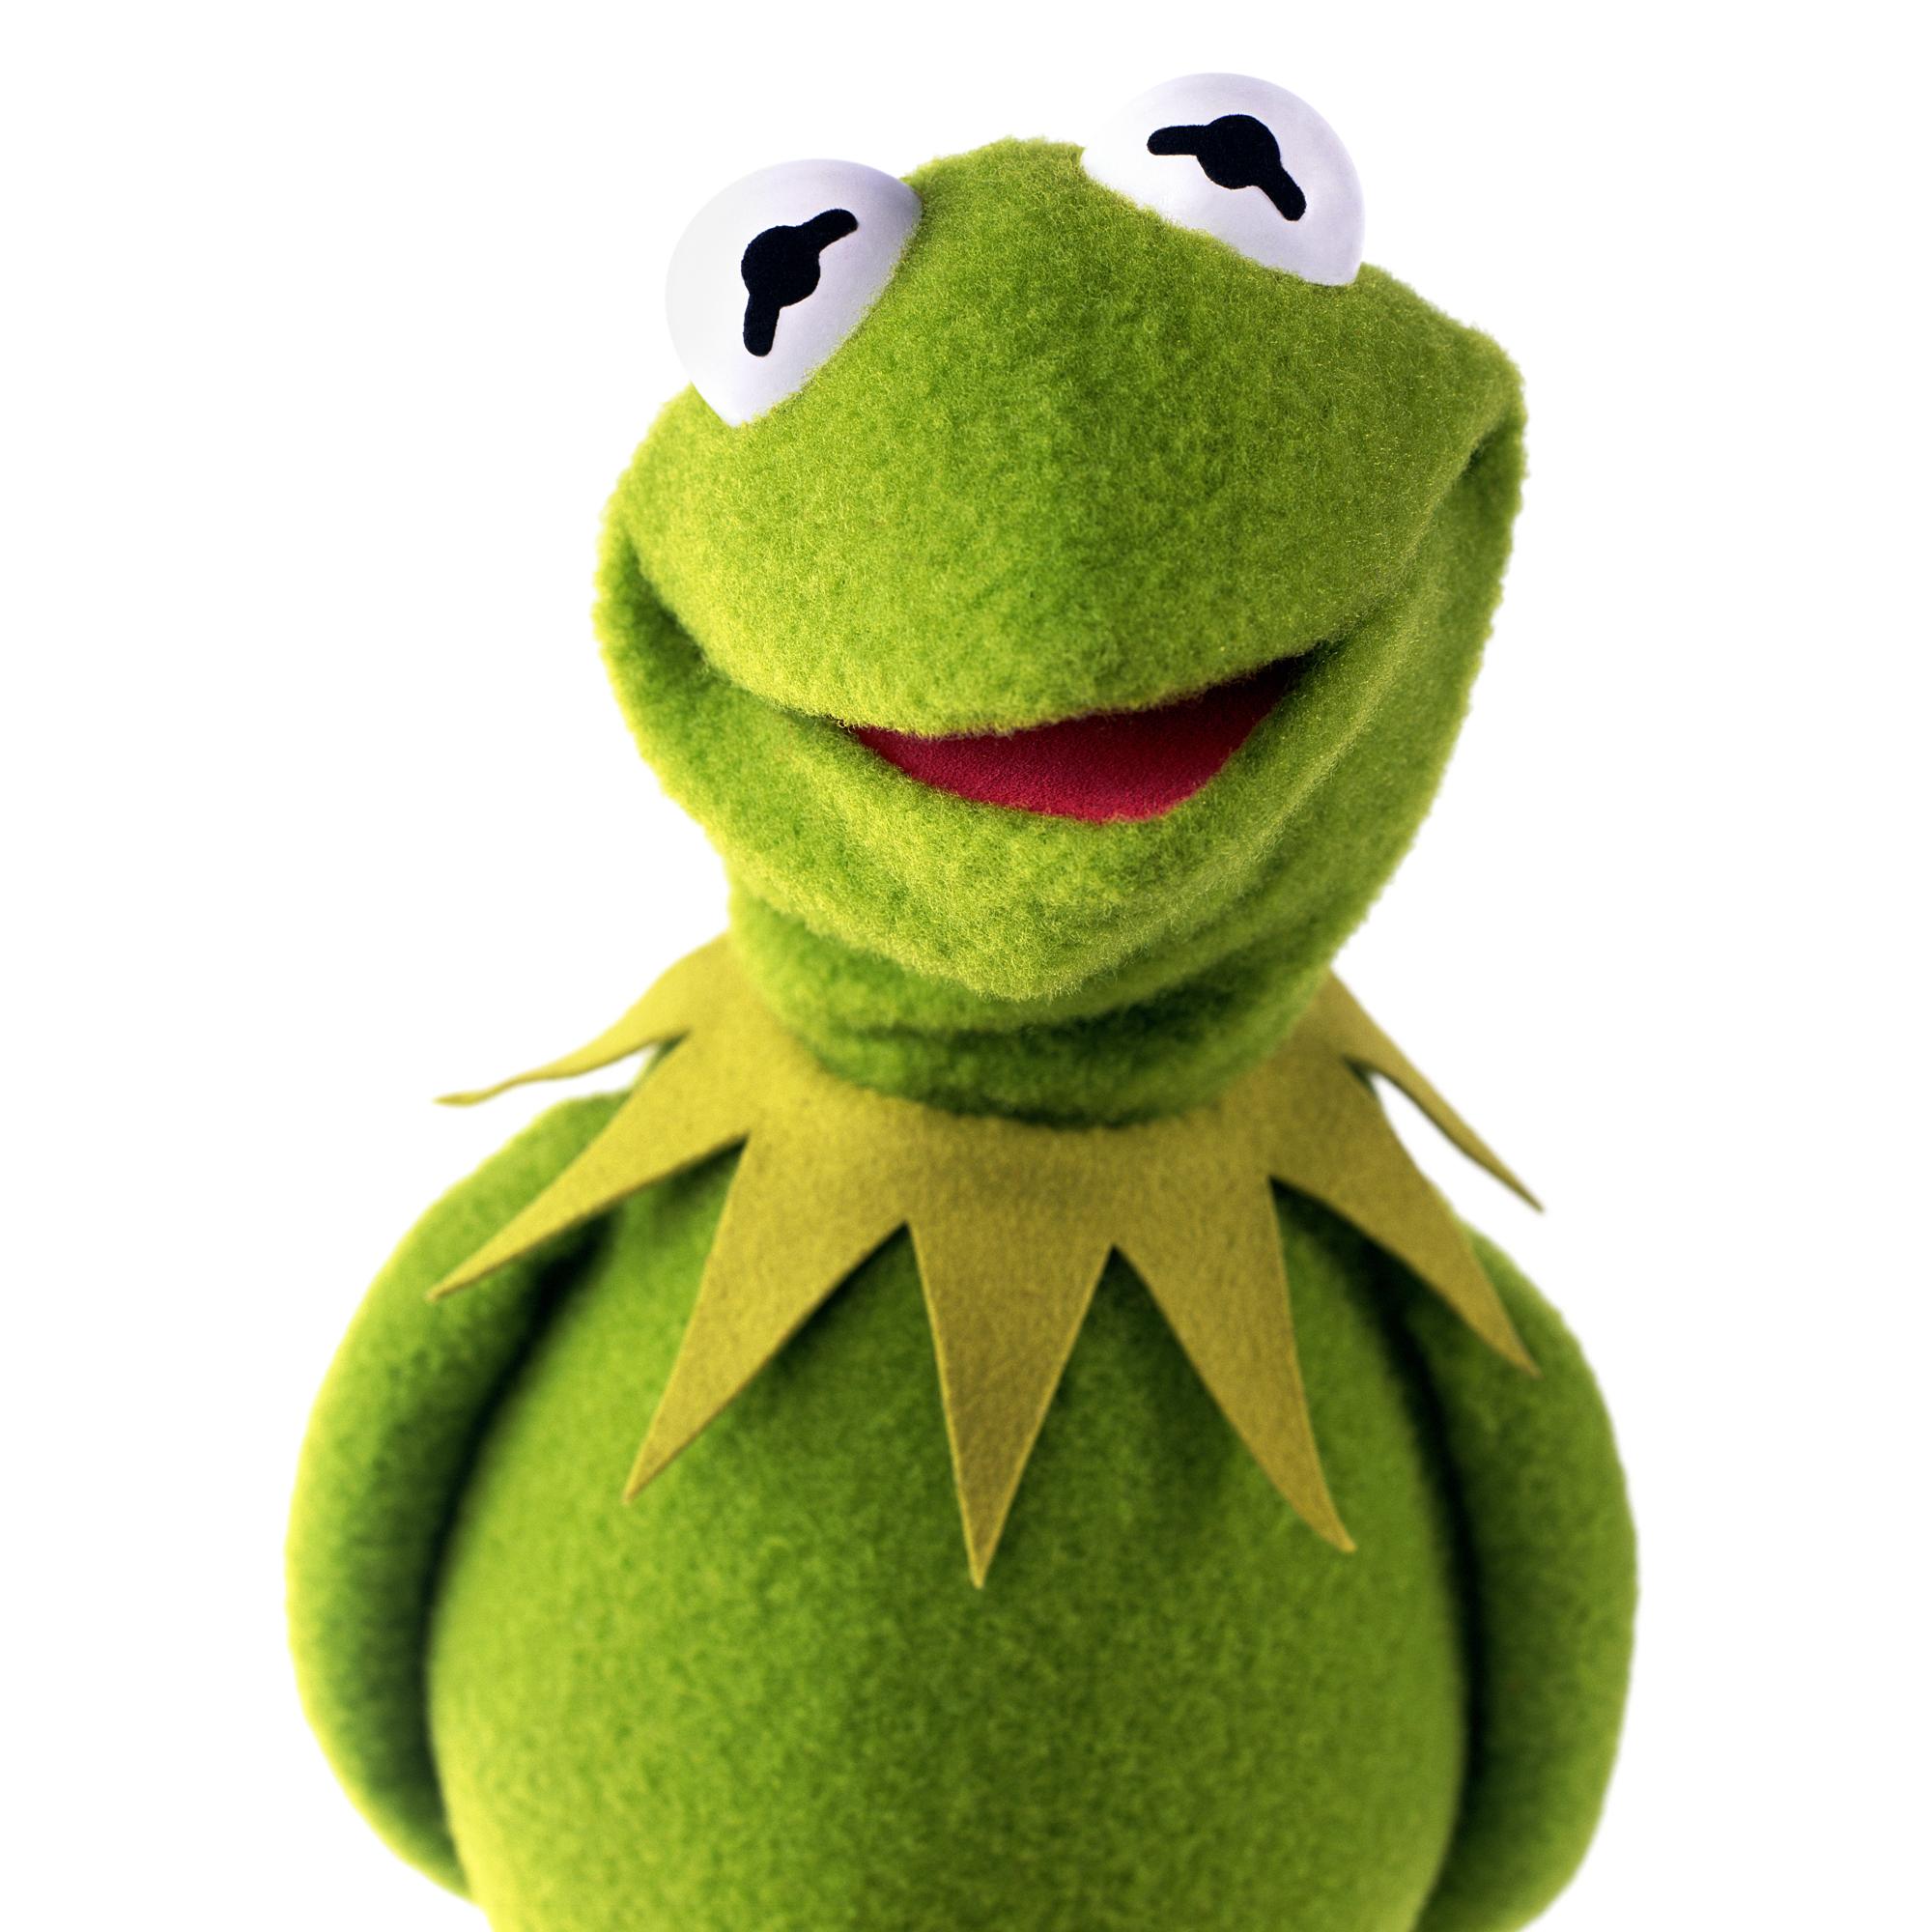 Kermitphobia